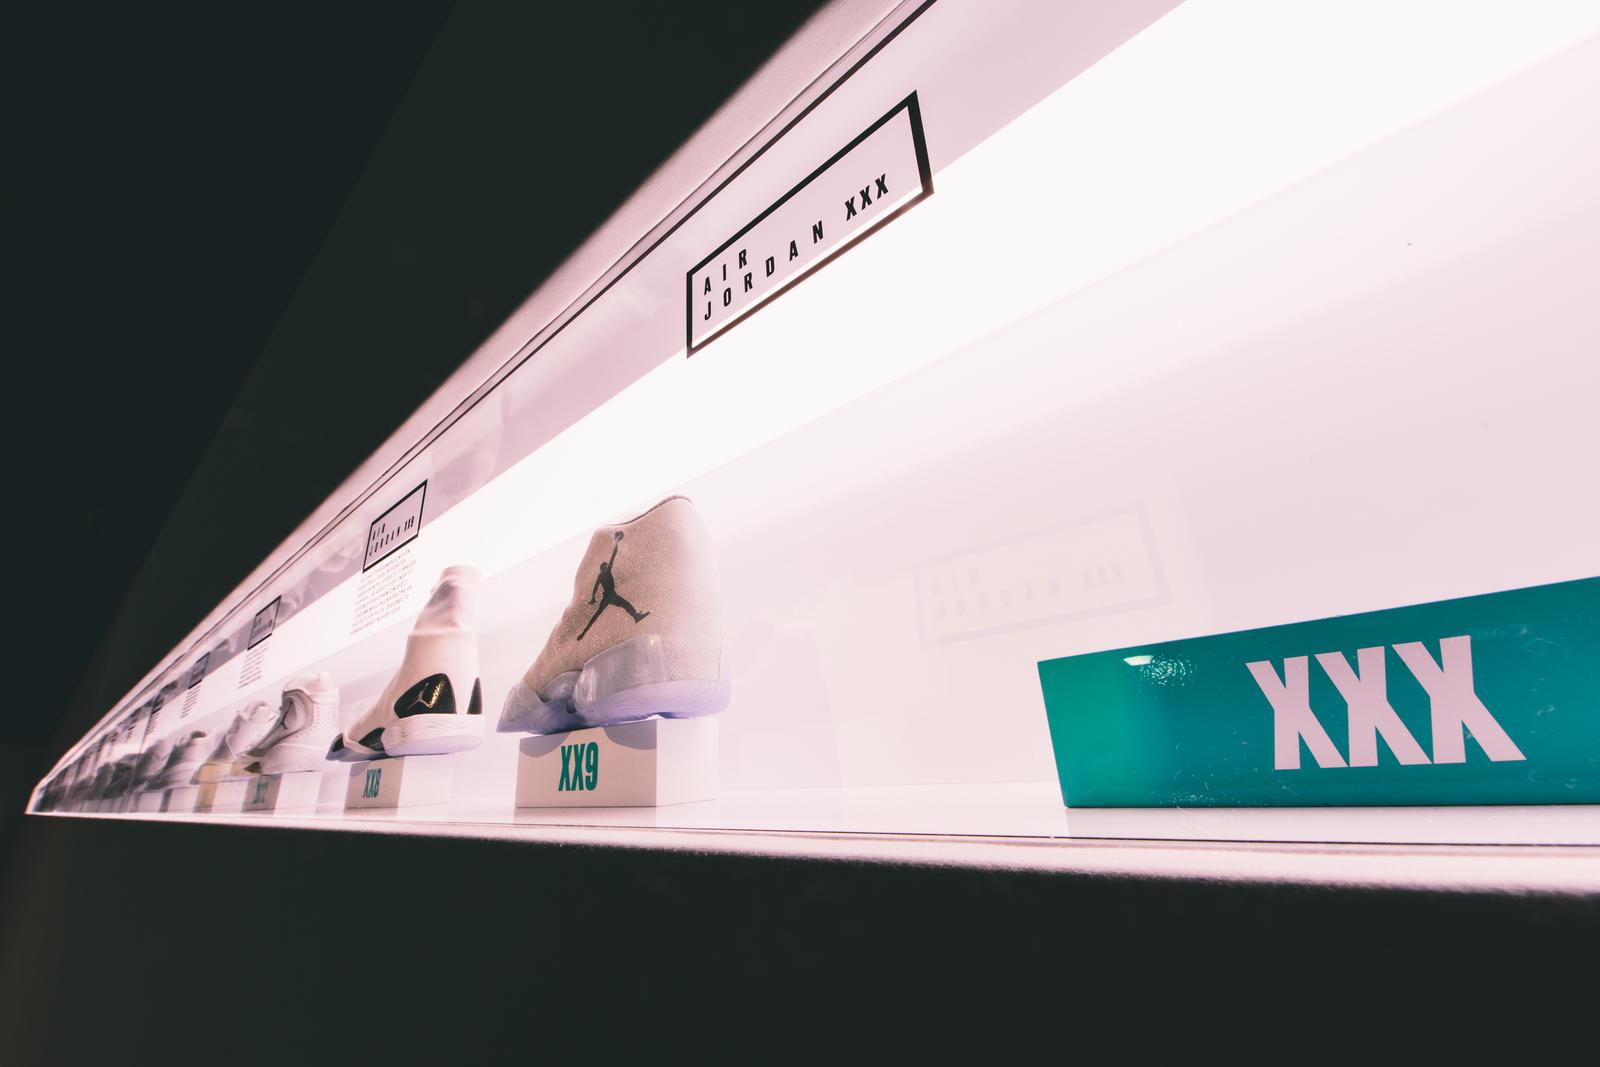 Jordan Brand's Pearl Pavilion